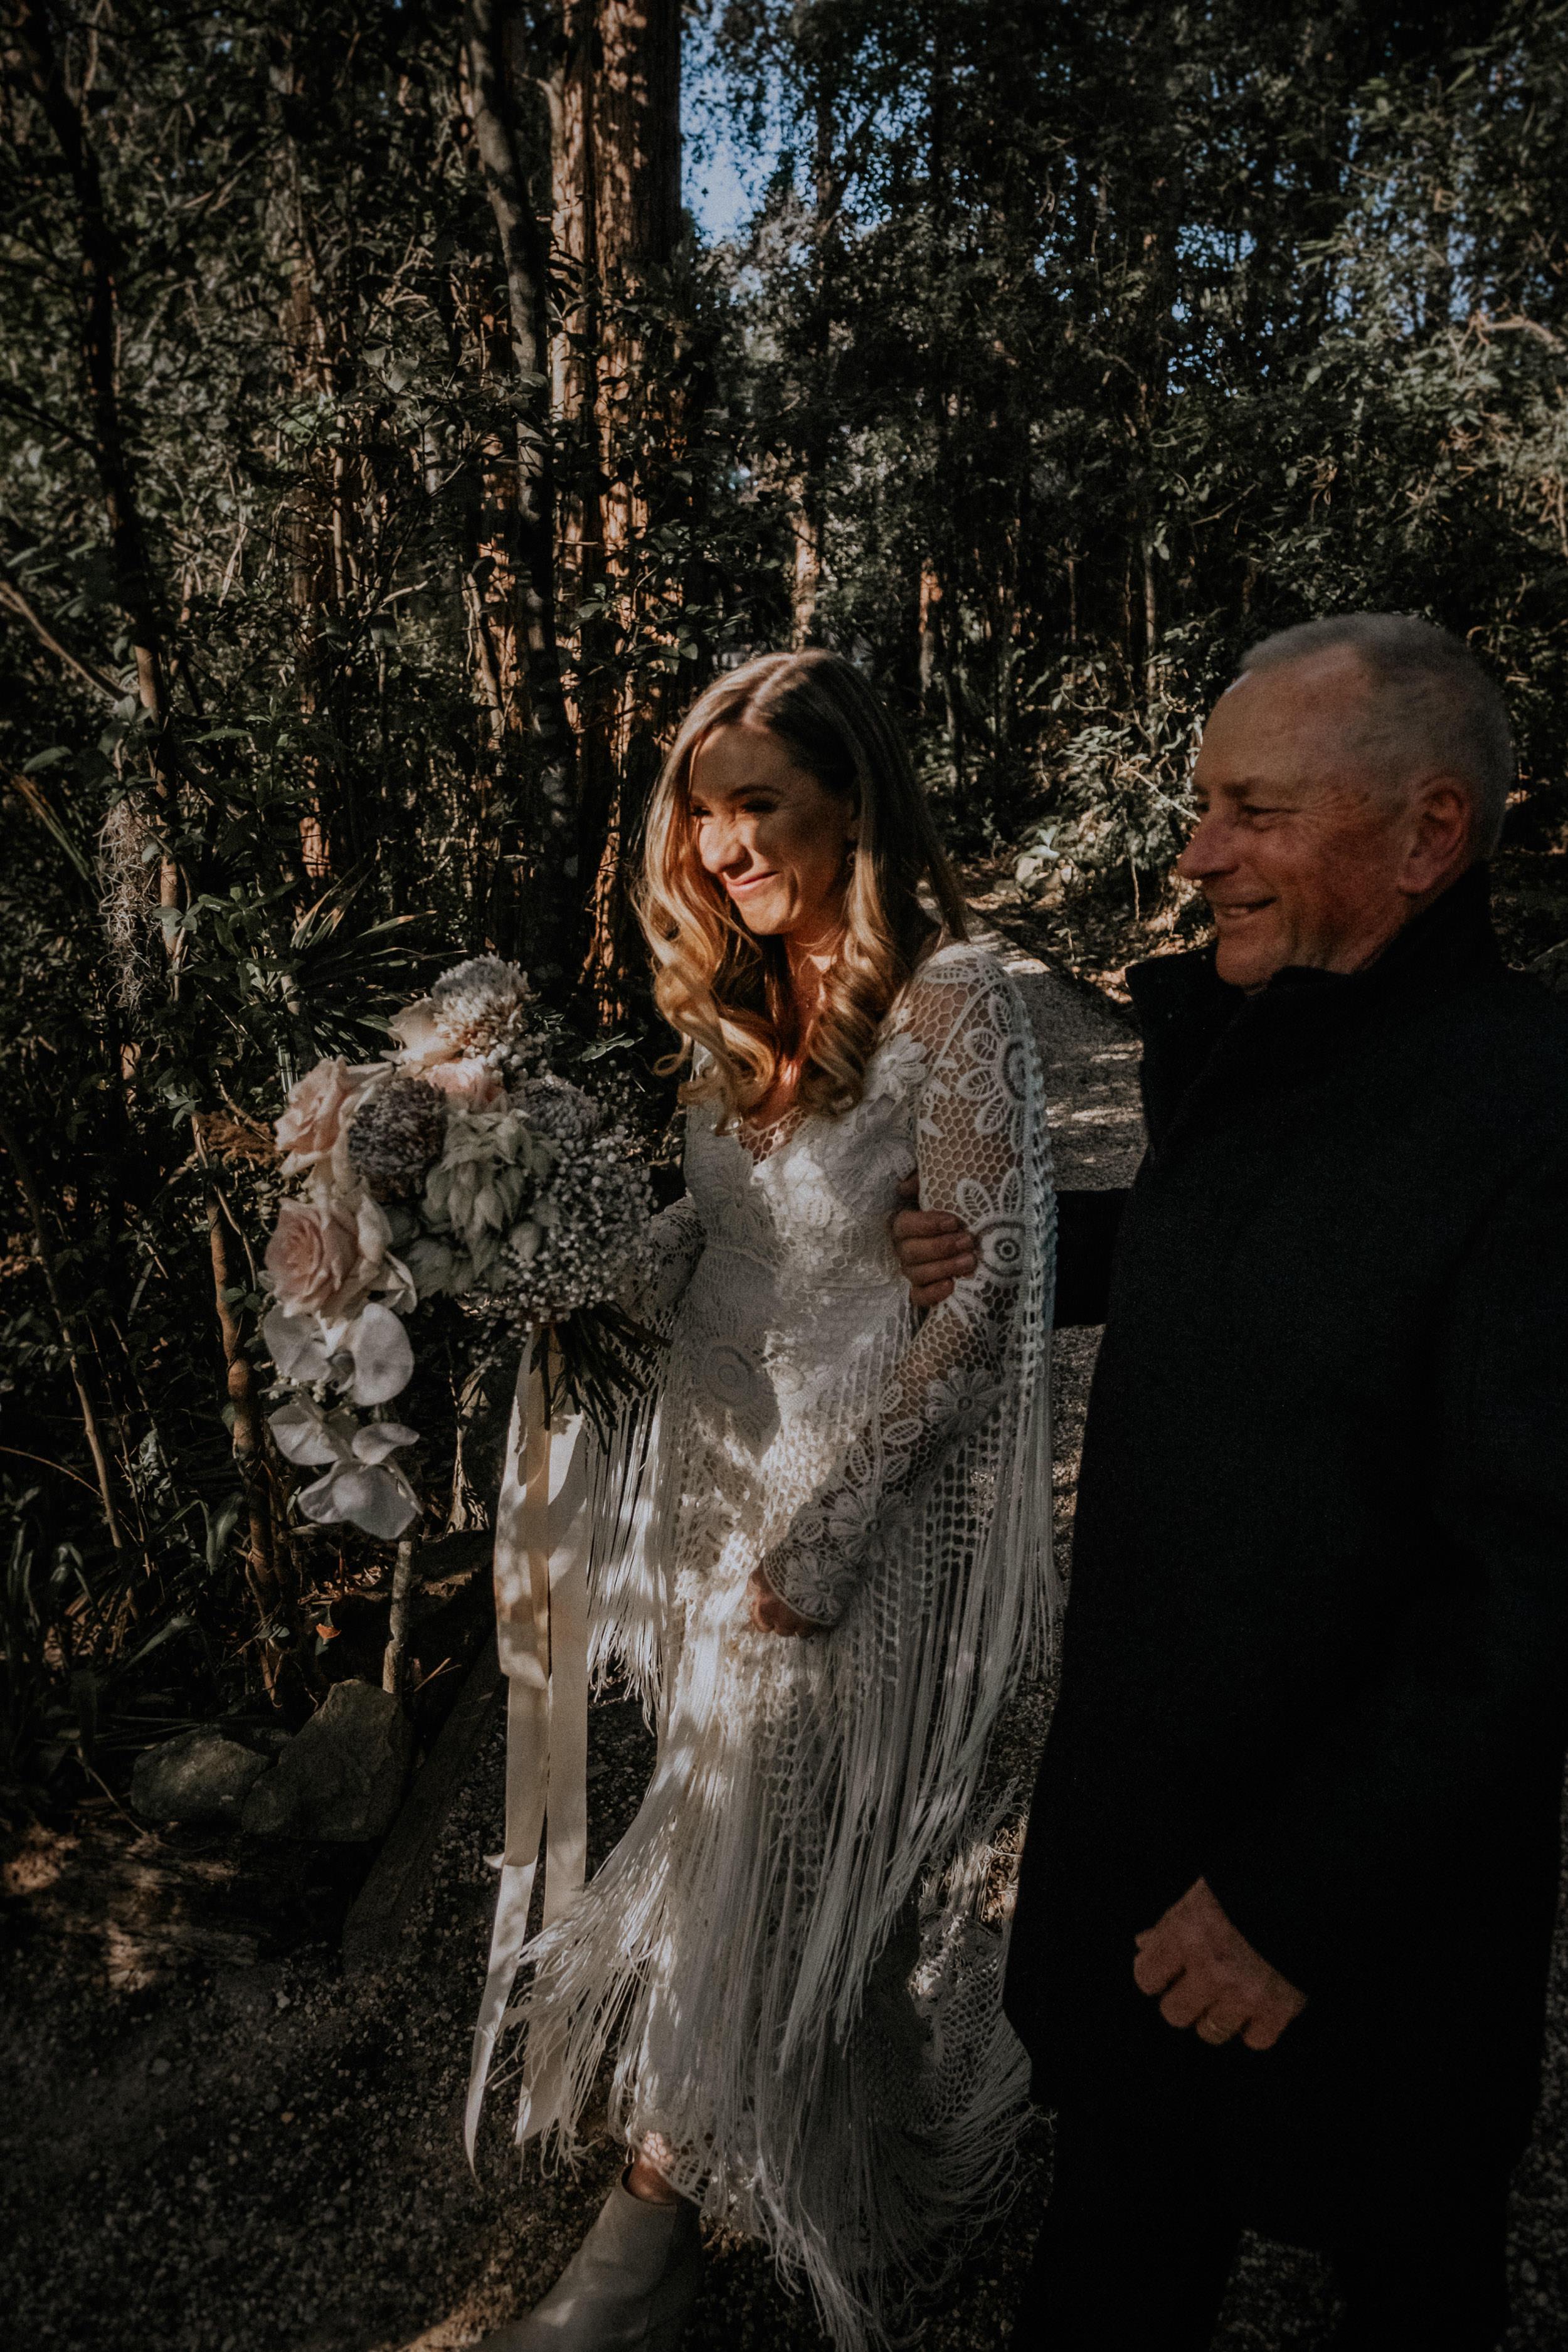 S&A Elopement - Kings & Thieves - Shred 'Til Dead - Central Coast Beach Forest Wedding - 159.jpg